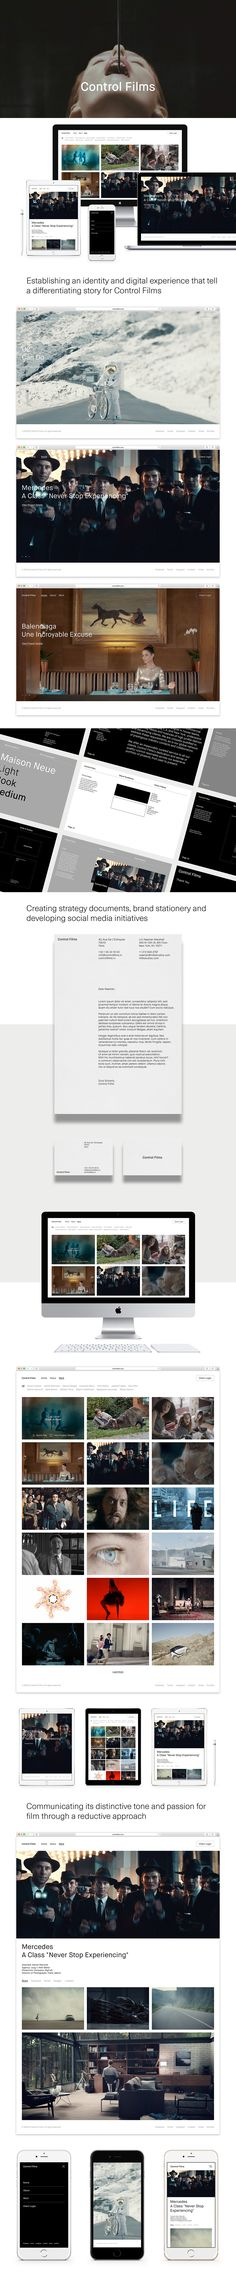 Art Direction — Brand Strategy and Positioning — Branding & Identity — Concept Development — Digital Design — Print Communications — User Interface Design